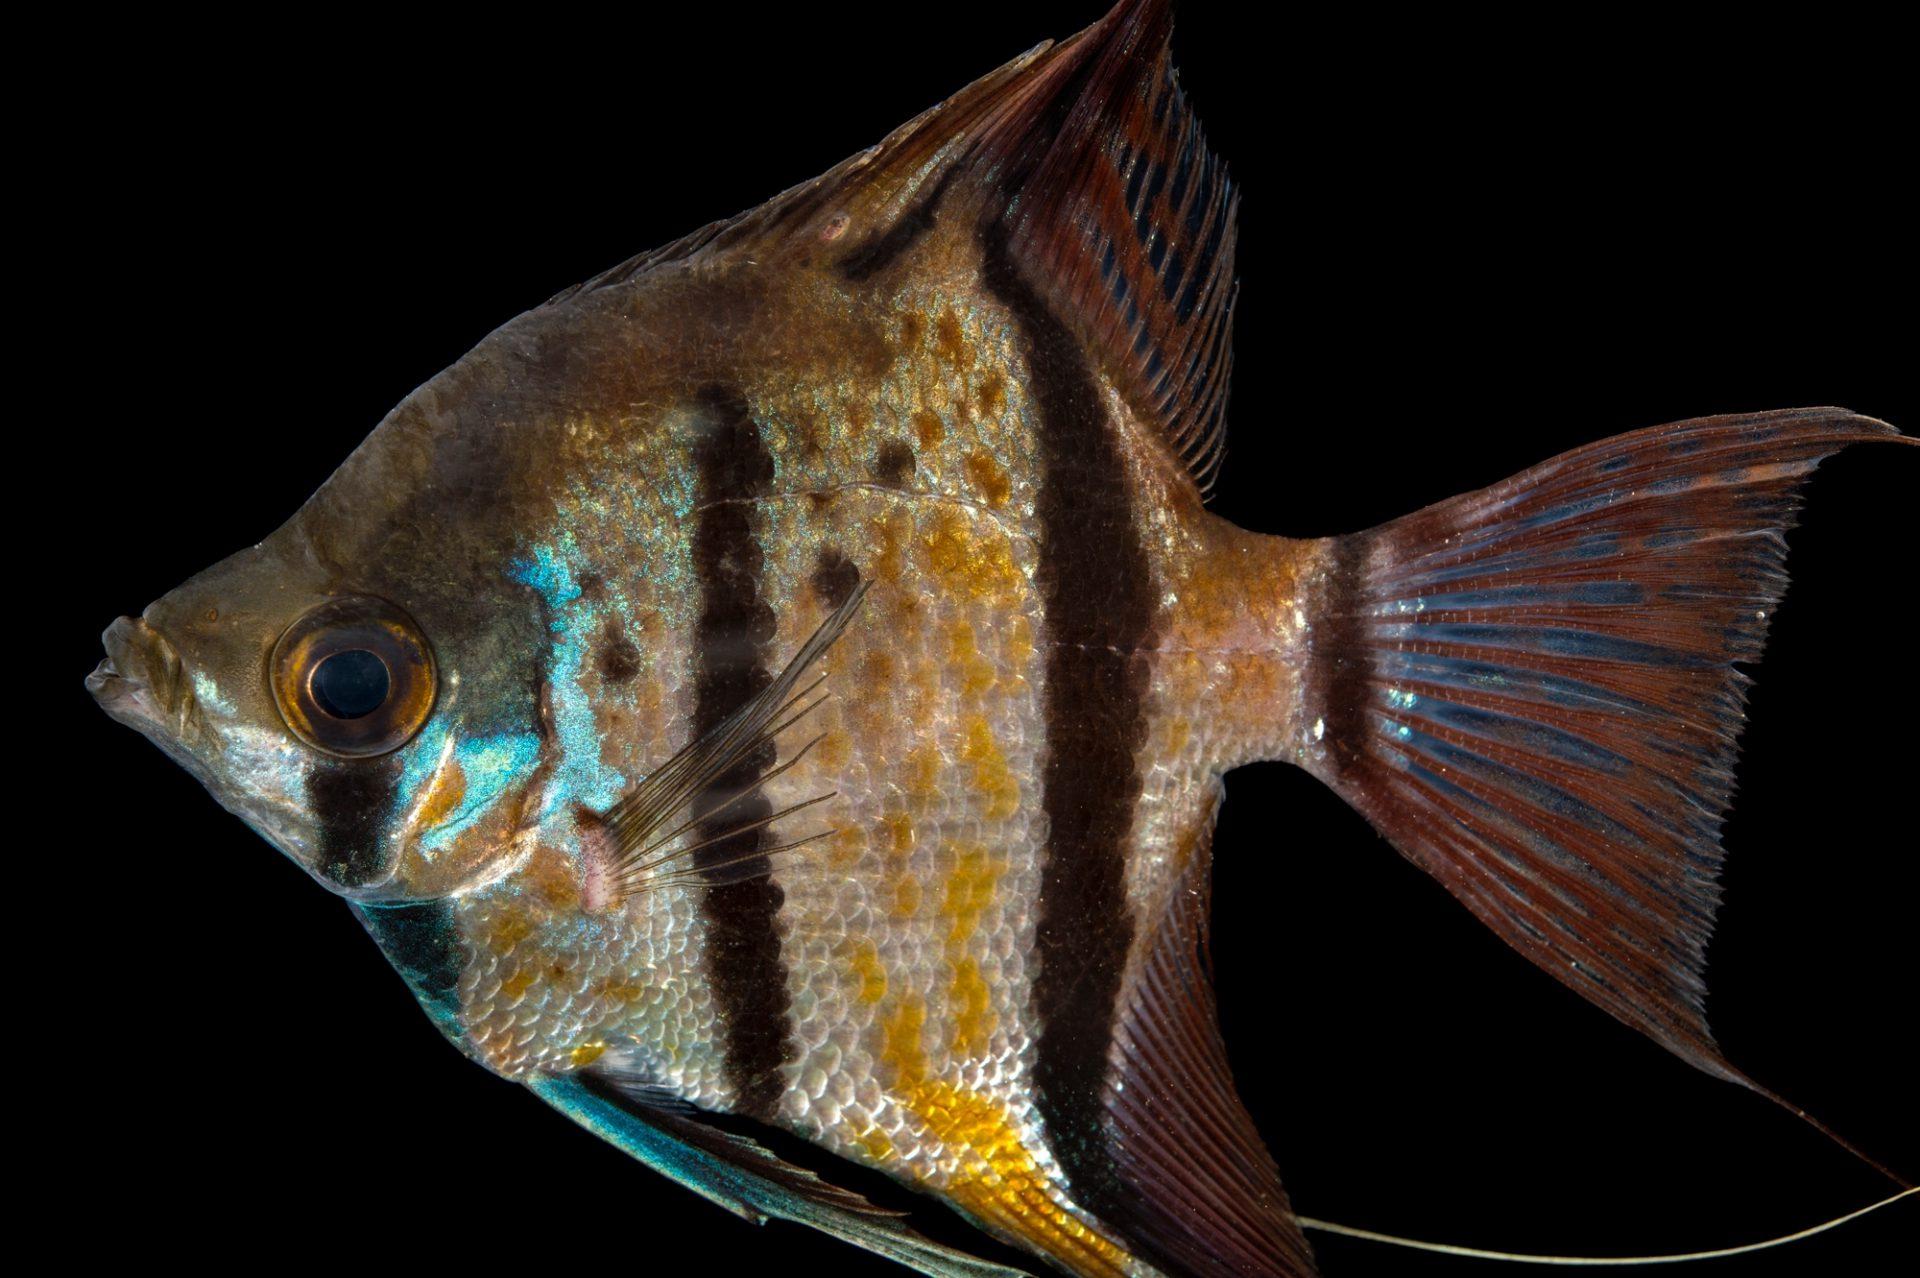 Photo: Freshwater angelfish (Pterophyllum scalare), of Peru, at L'aquarium tropical du palais de la Porte DorŽe.